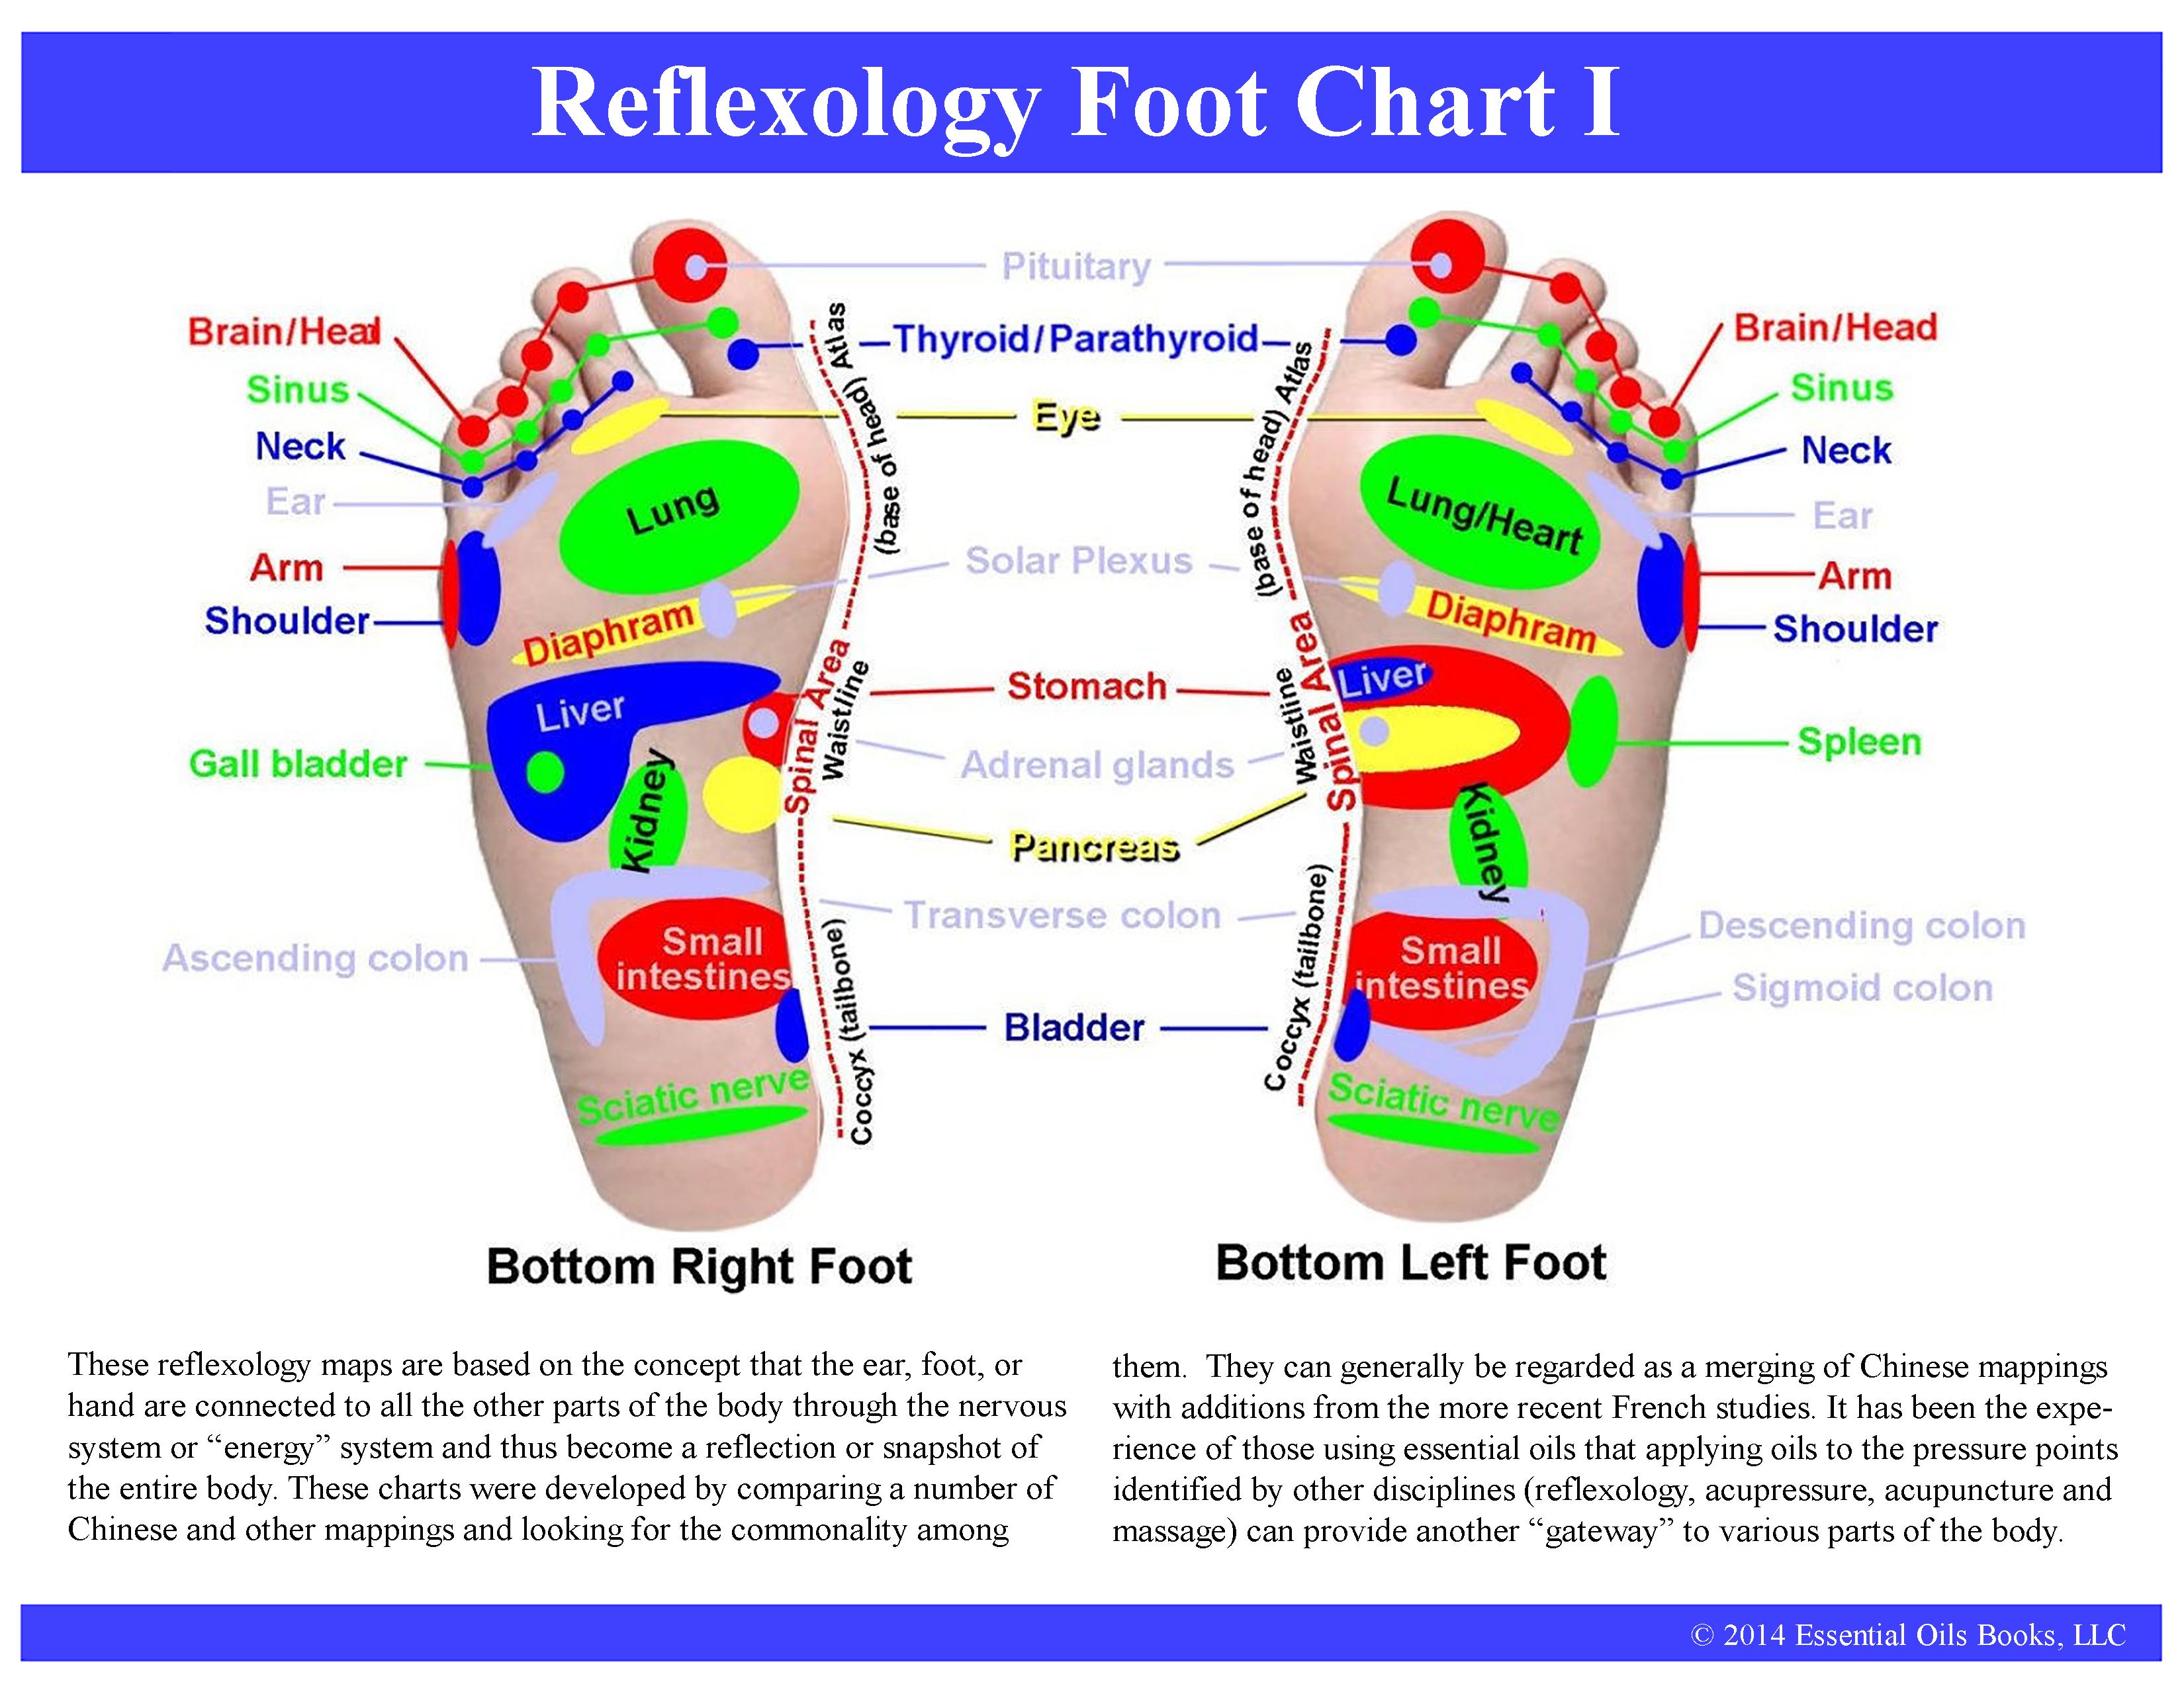 Foot Reflexology Diagram Reflexology Feet Charts 10 Handouts Home